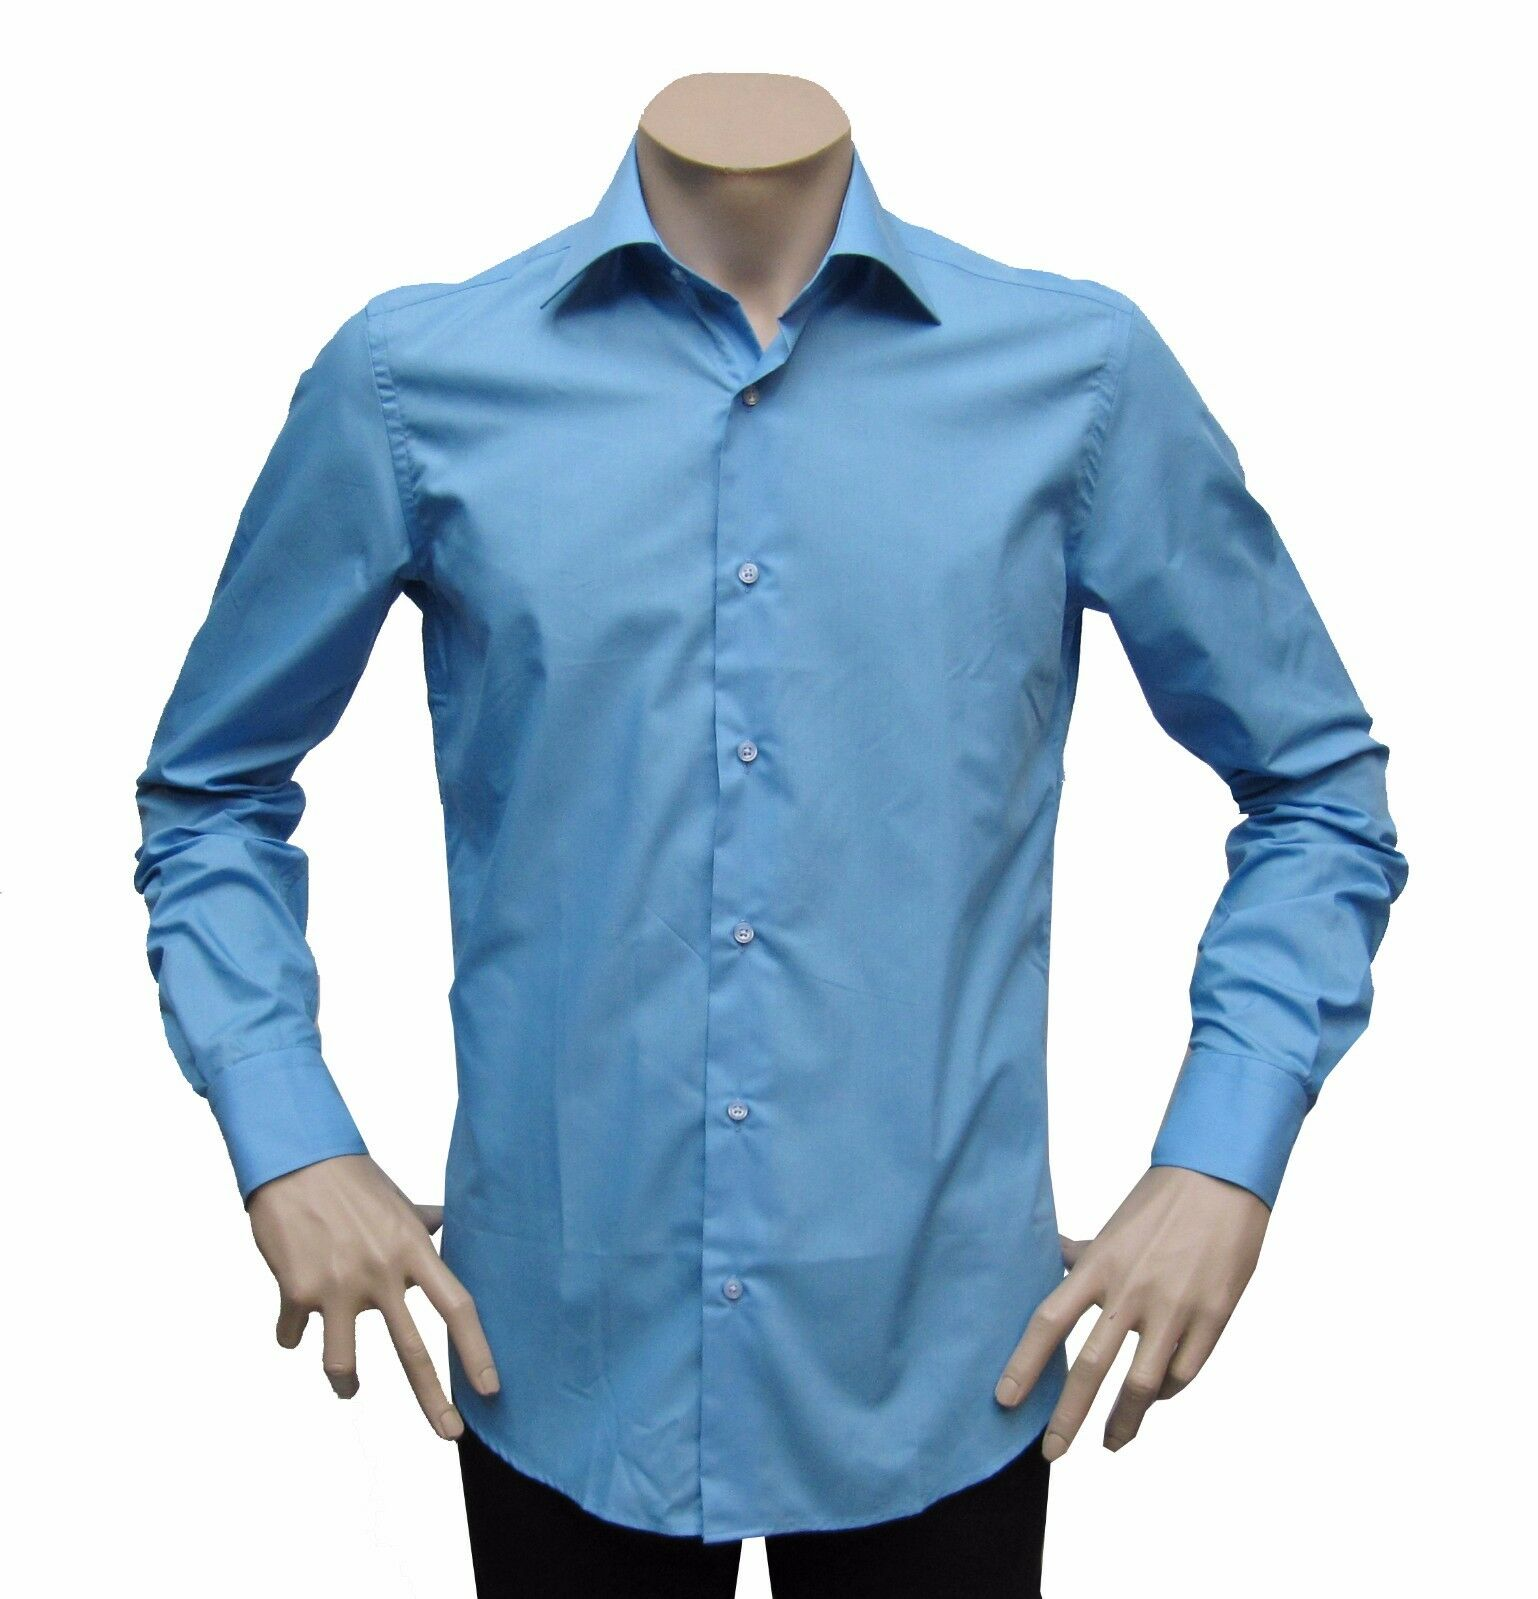 Slim-fit Hemd extra lange Arme 74 cm Gr.3XL Dunkelblue